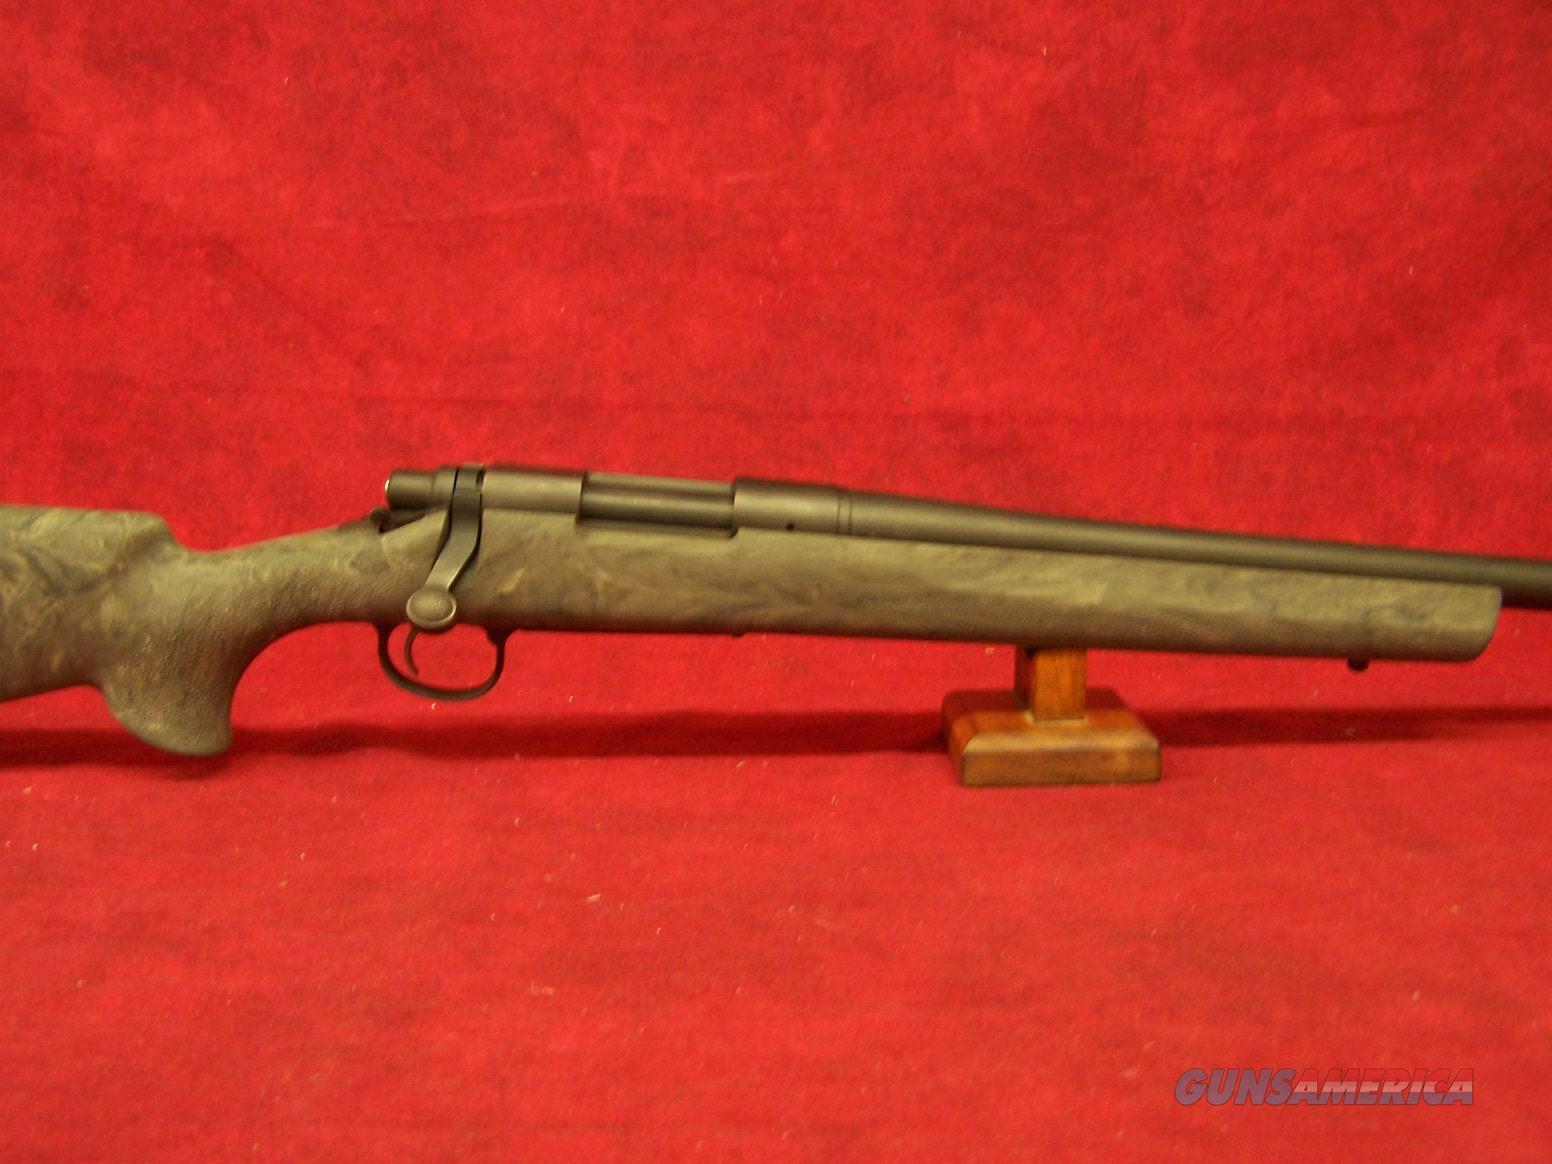 "Remington Model 700 .308 16.5"" Threaded Bull Barrel (85538)  Guns > Rifles > Remington Rifles - Modern > Model 700 > Sporting"